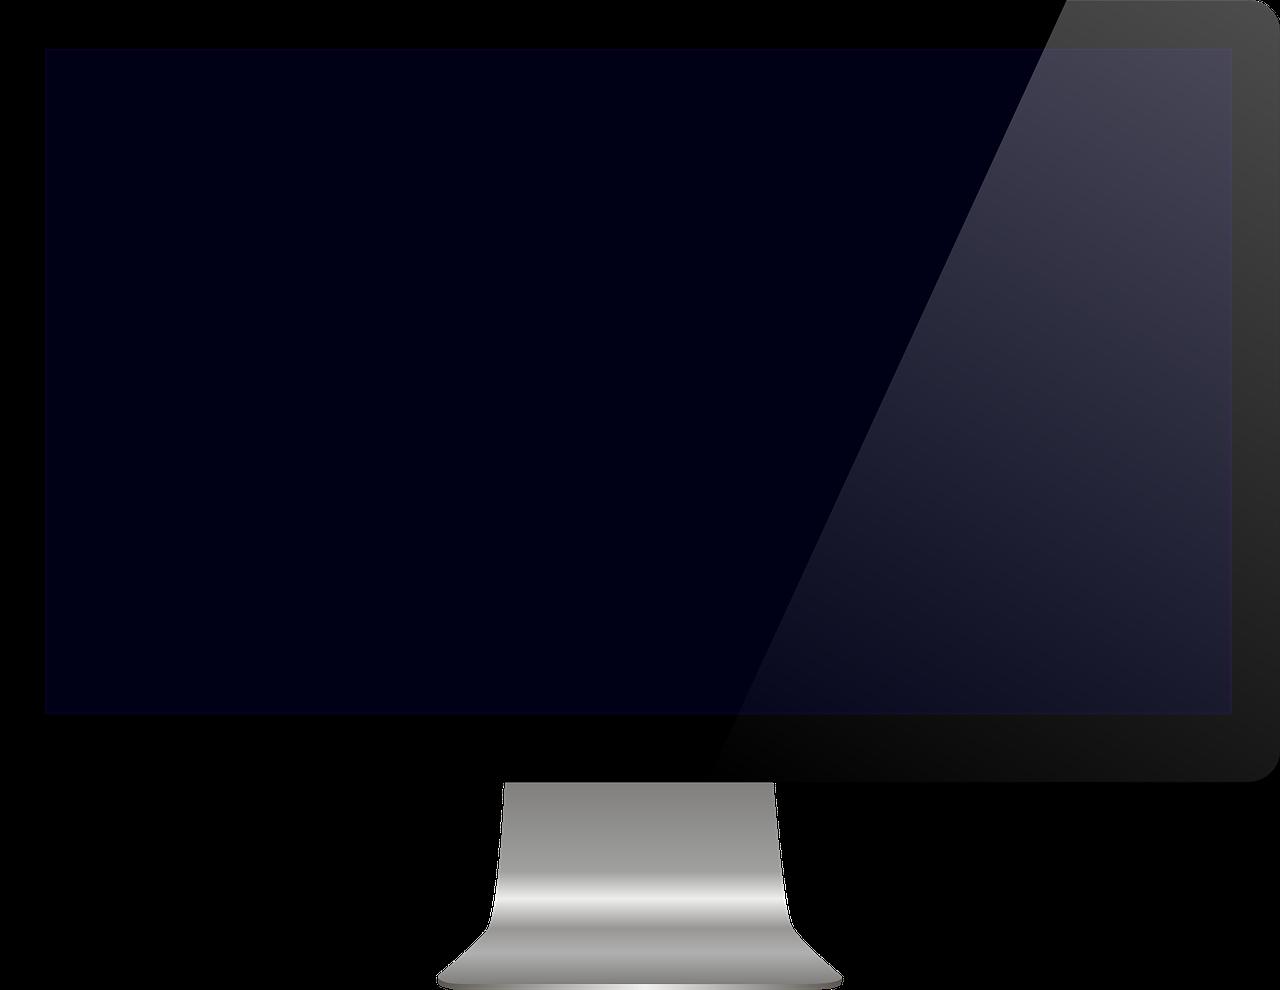 monitor-312382_1280